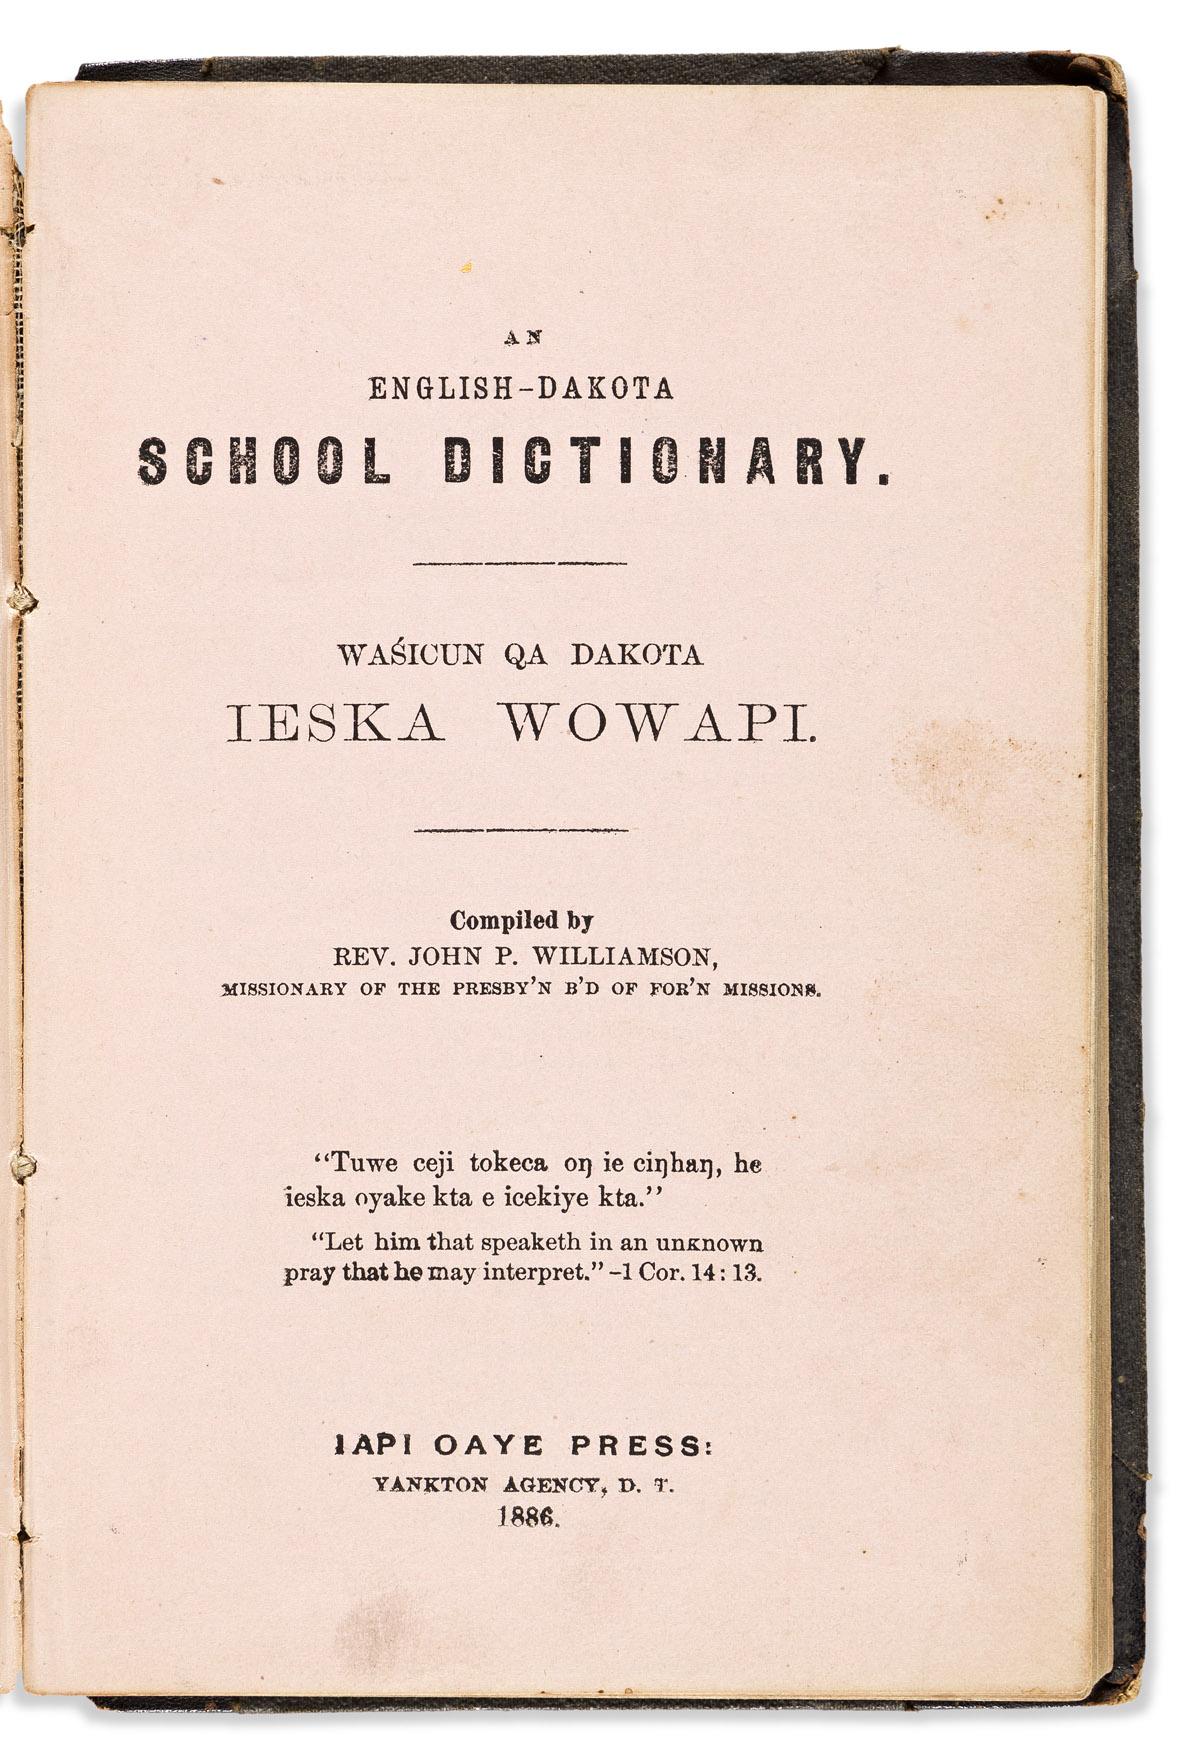 (AMERICAN INDIANS.) John P. Williamson, compiler. An English-Dakota School Dictionary. Wasicun Qa Dakota Ieska Wowapi.